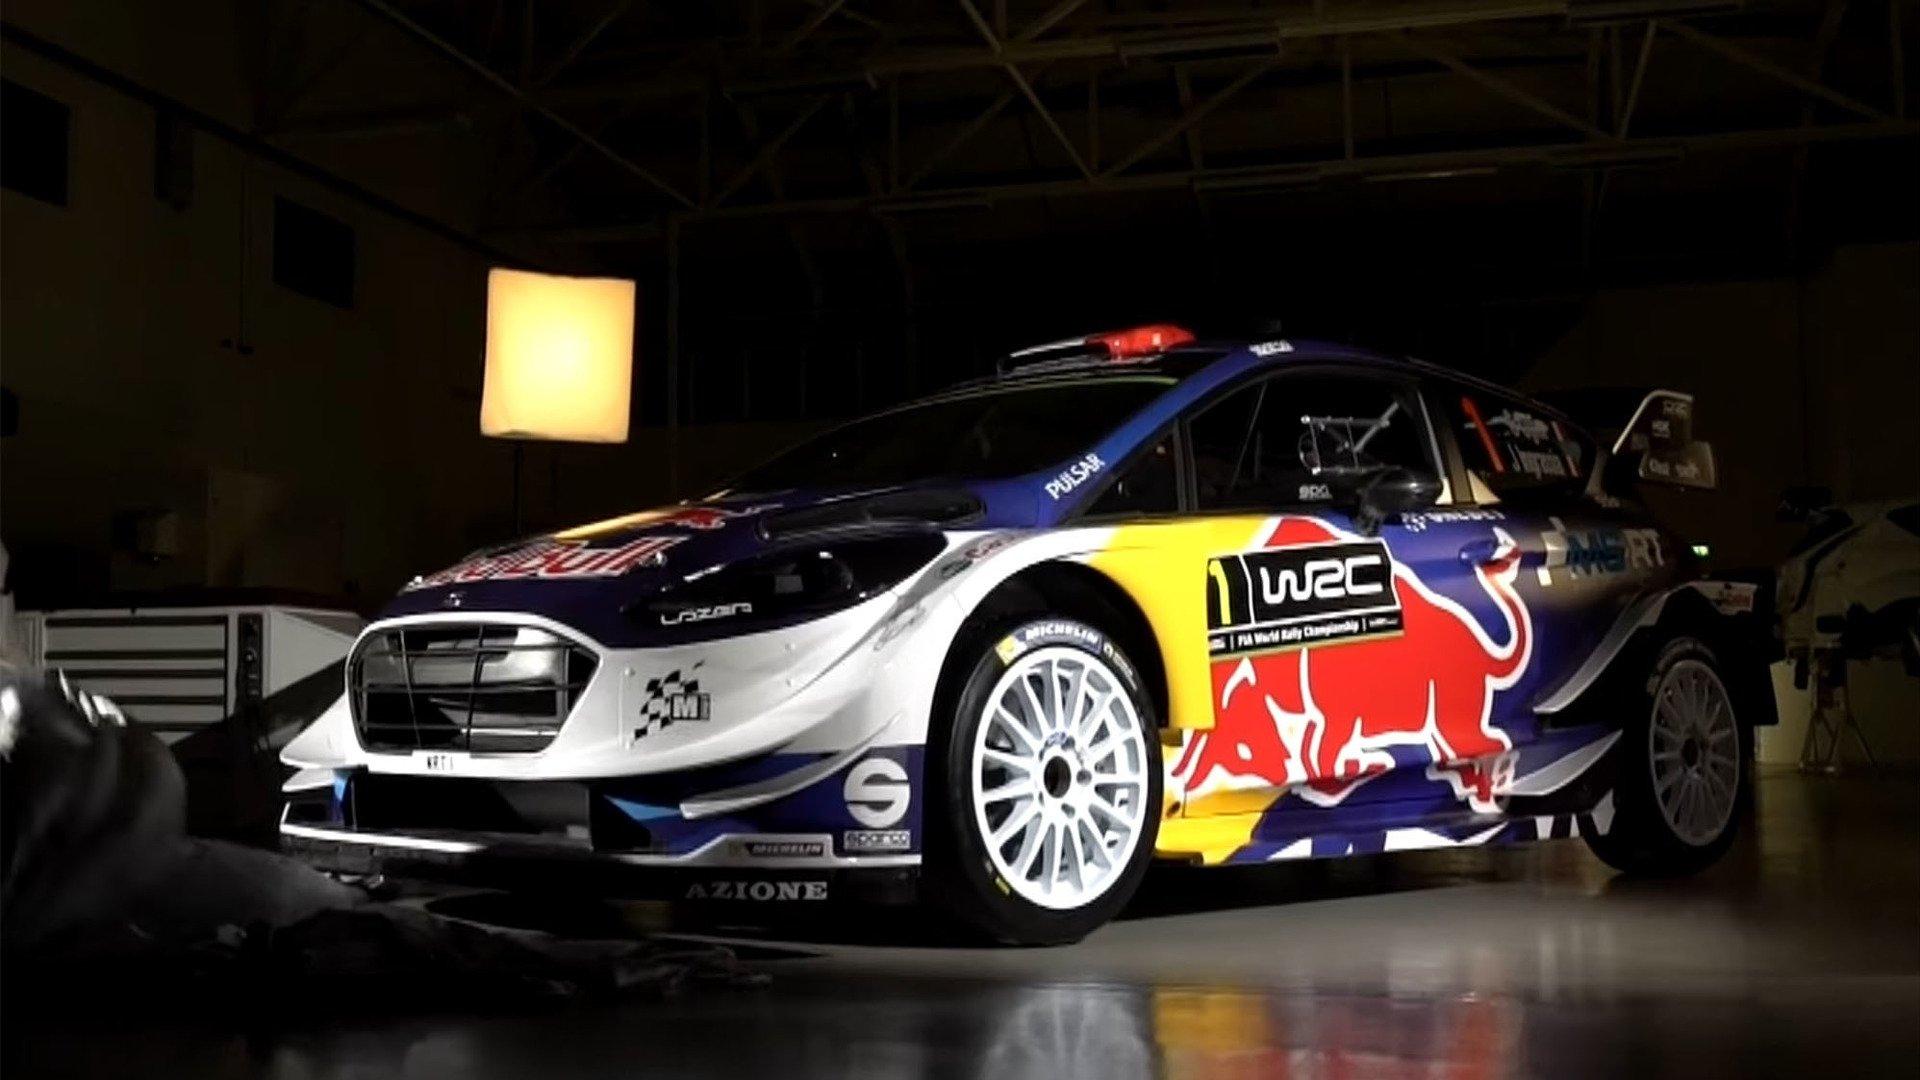 Ford Fiesta Wrc 2018 >> VIDEO: 'Livery' perlumbaan Ford Fiesta WRC 2017 didedahkan – Red Bull Racing untuk Sebastien ...